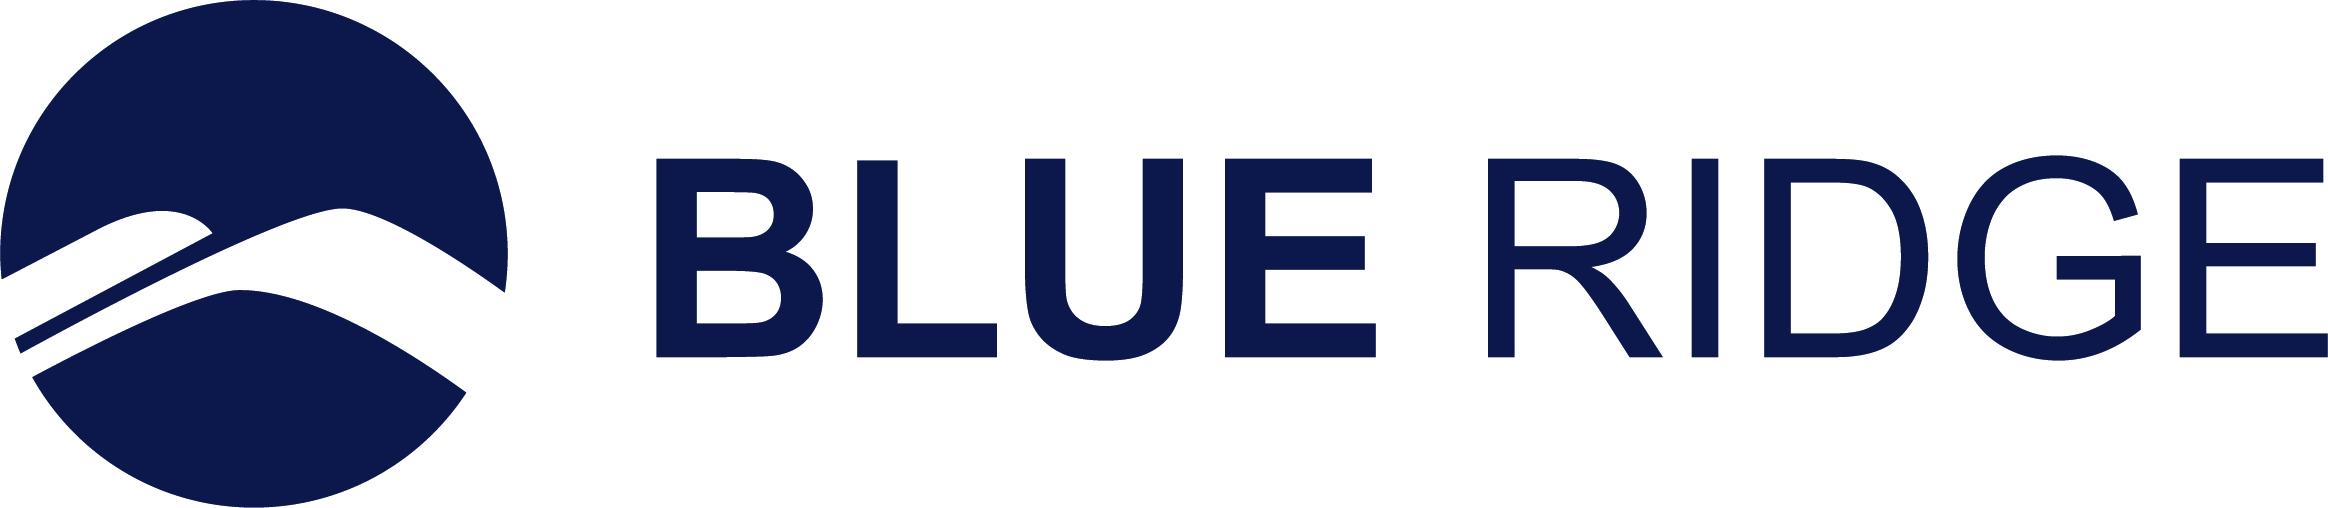 Registration Open Now for Blue Ridge BLUPRINT Virtual Conference Next Month